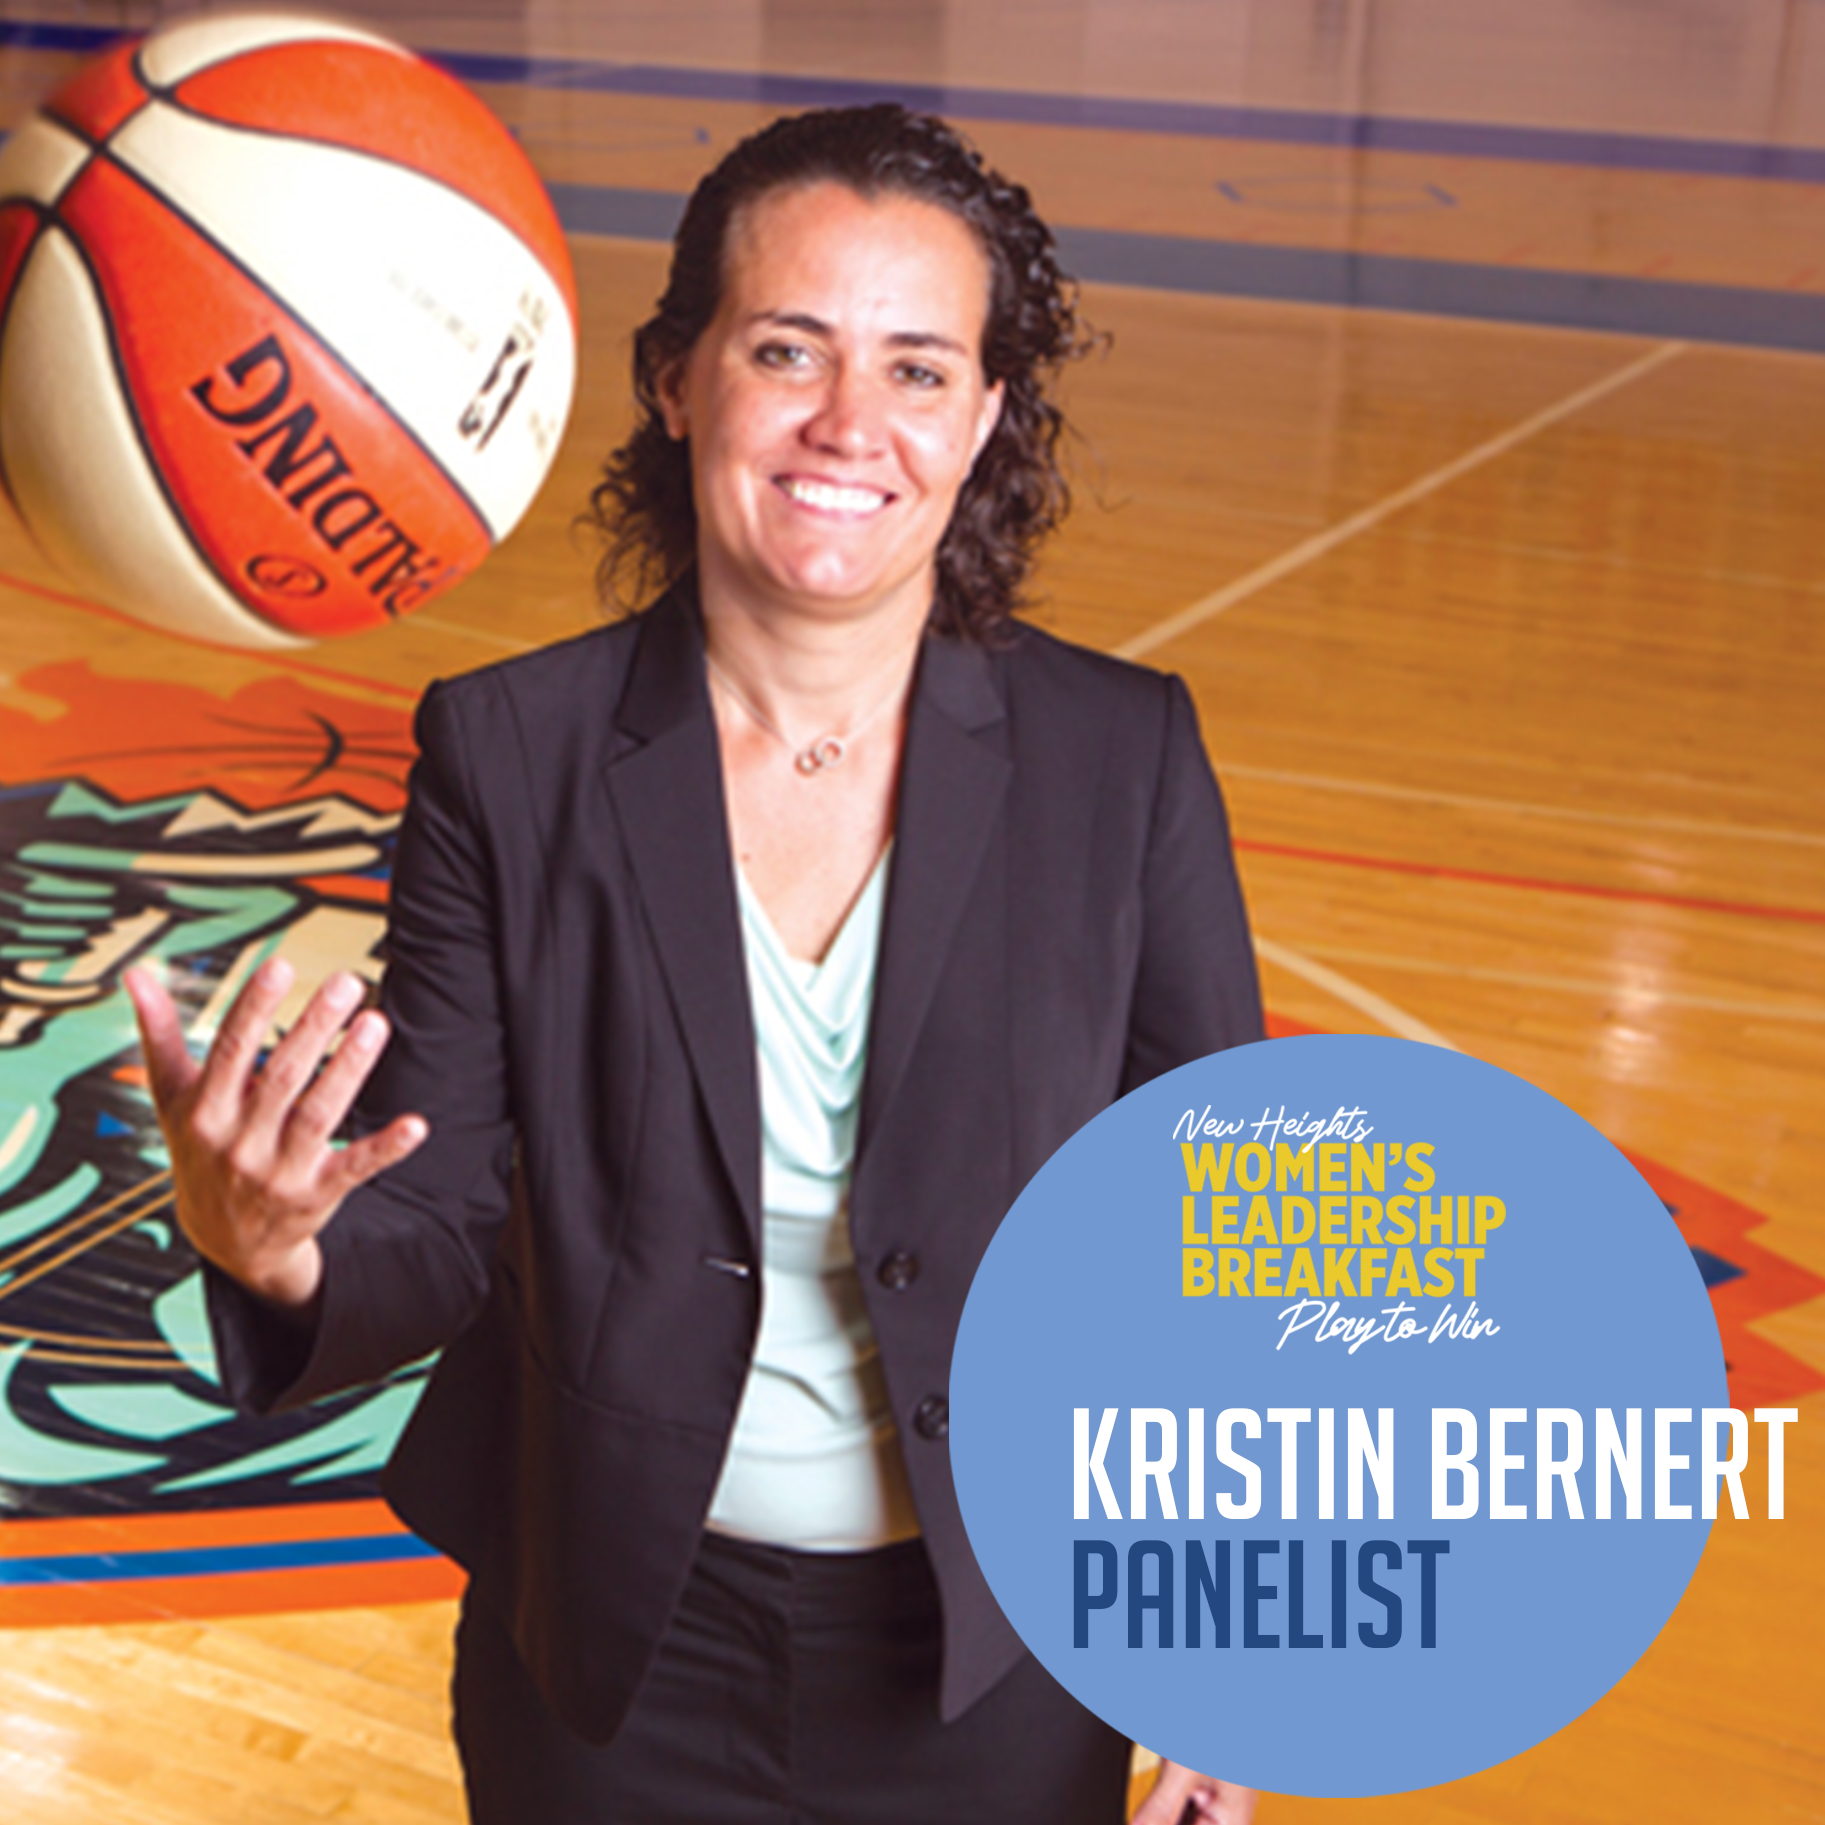 KRISTIN BERNERT  SVP of Business & Basketball Operations, New York Knicks